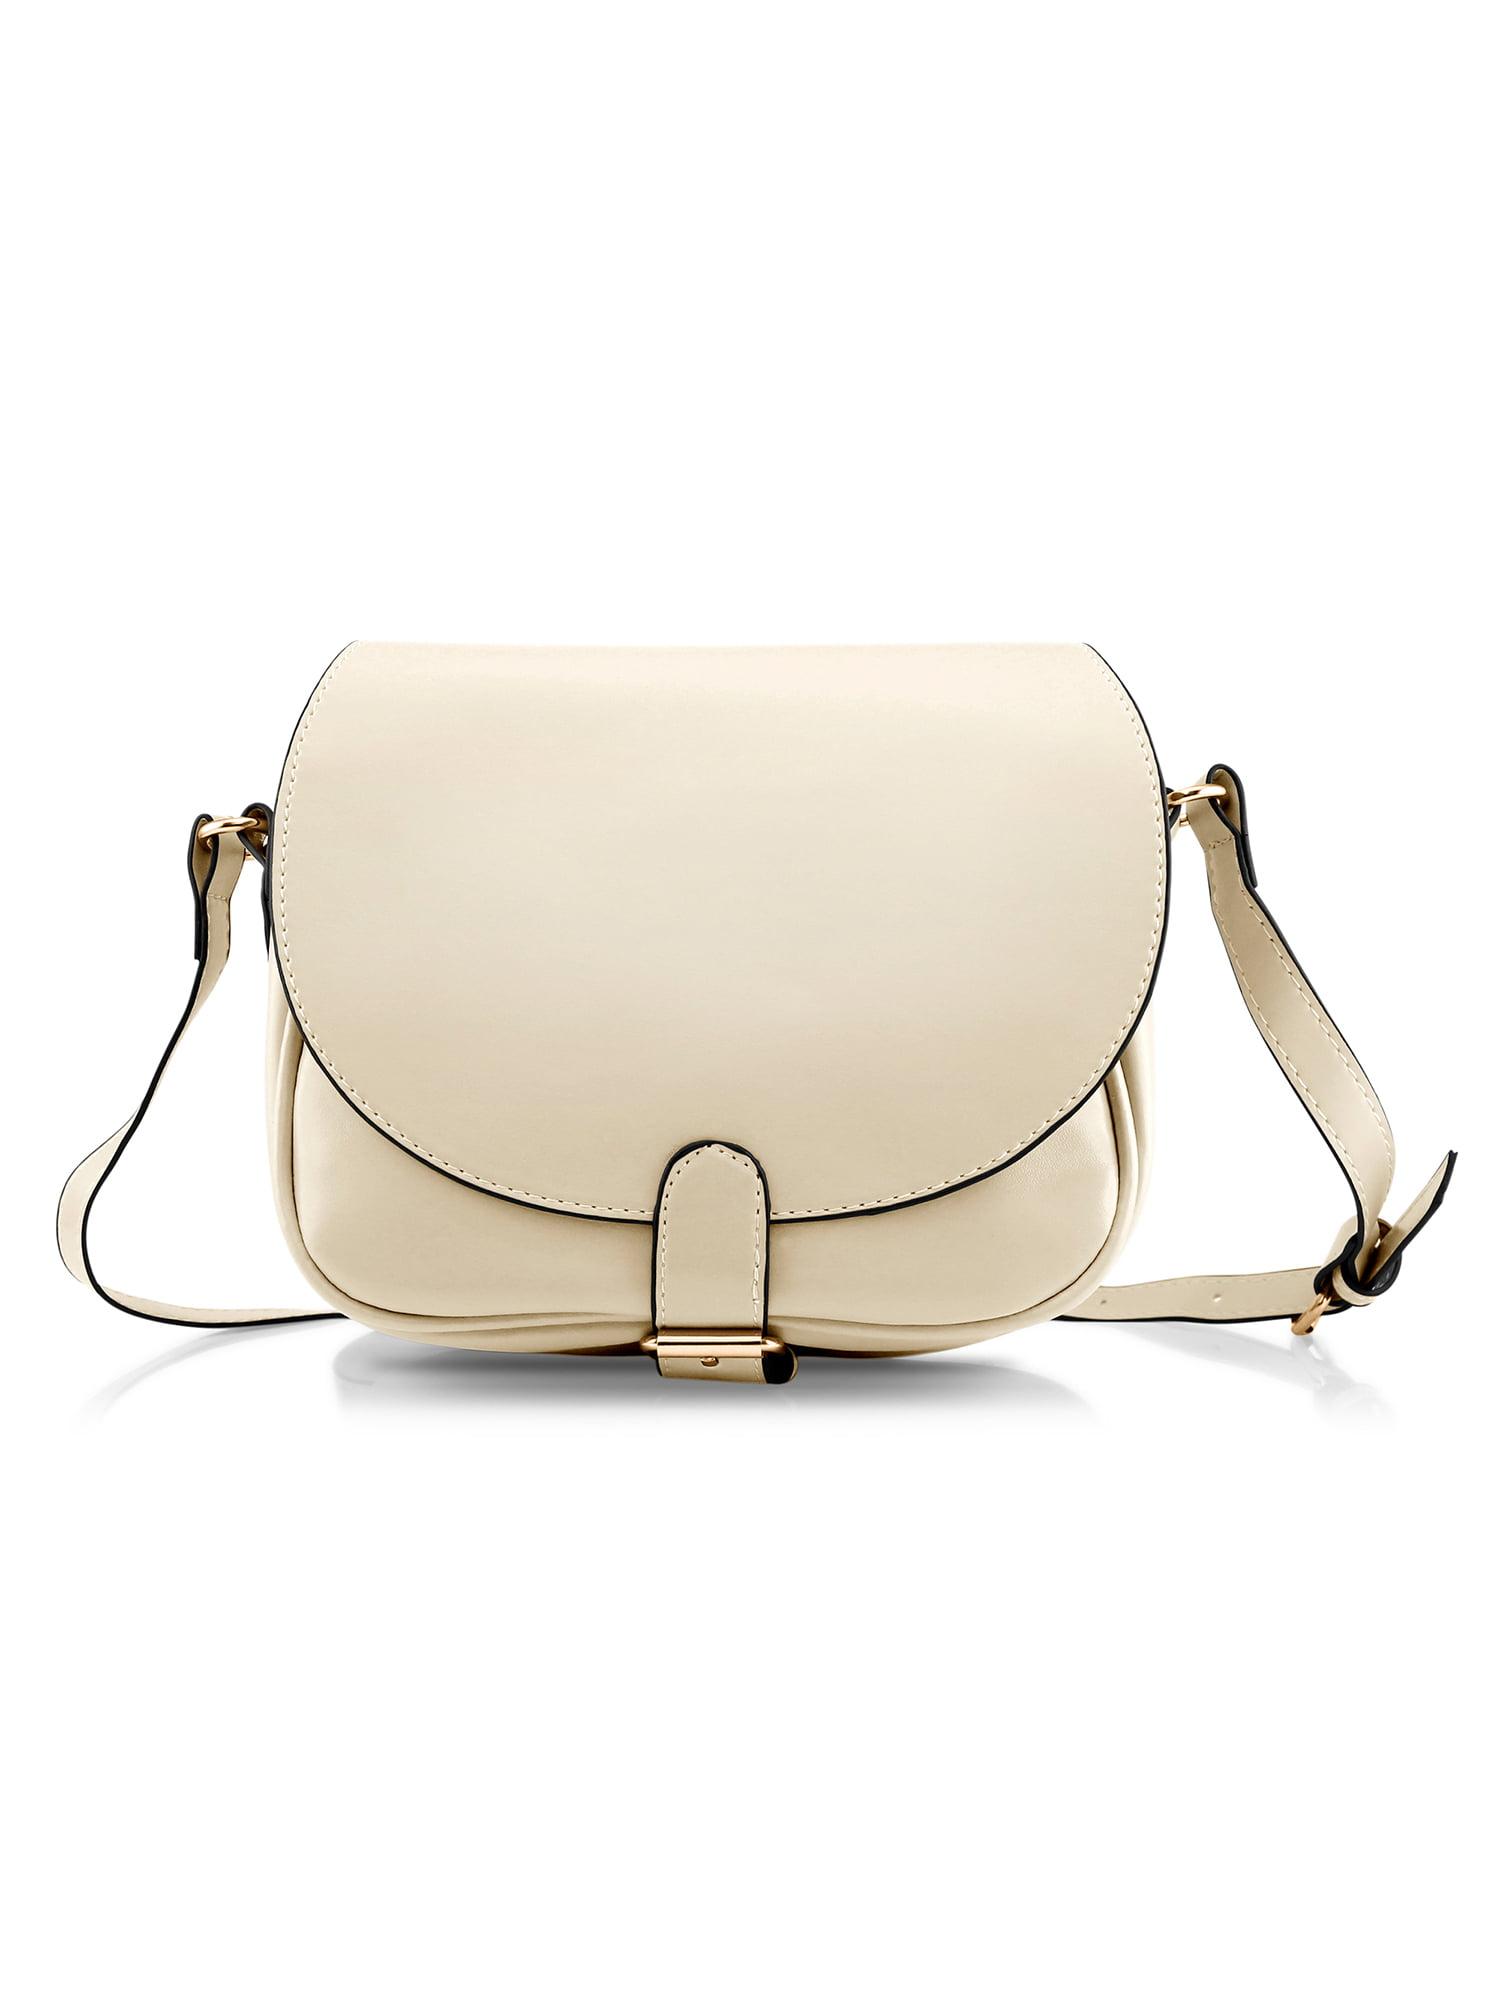 GEARONIC TM - Fashion Women Crossbody Handbag PU Leather Shoulder ... 089111256dc84